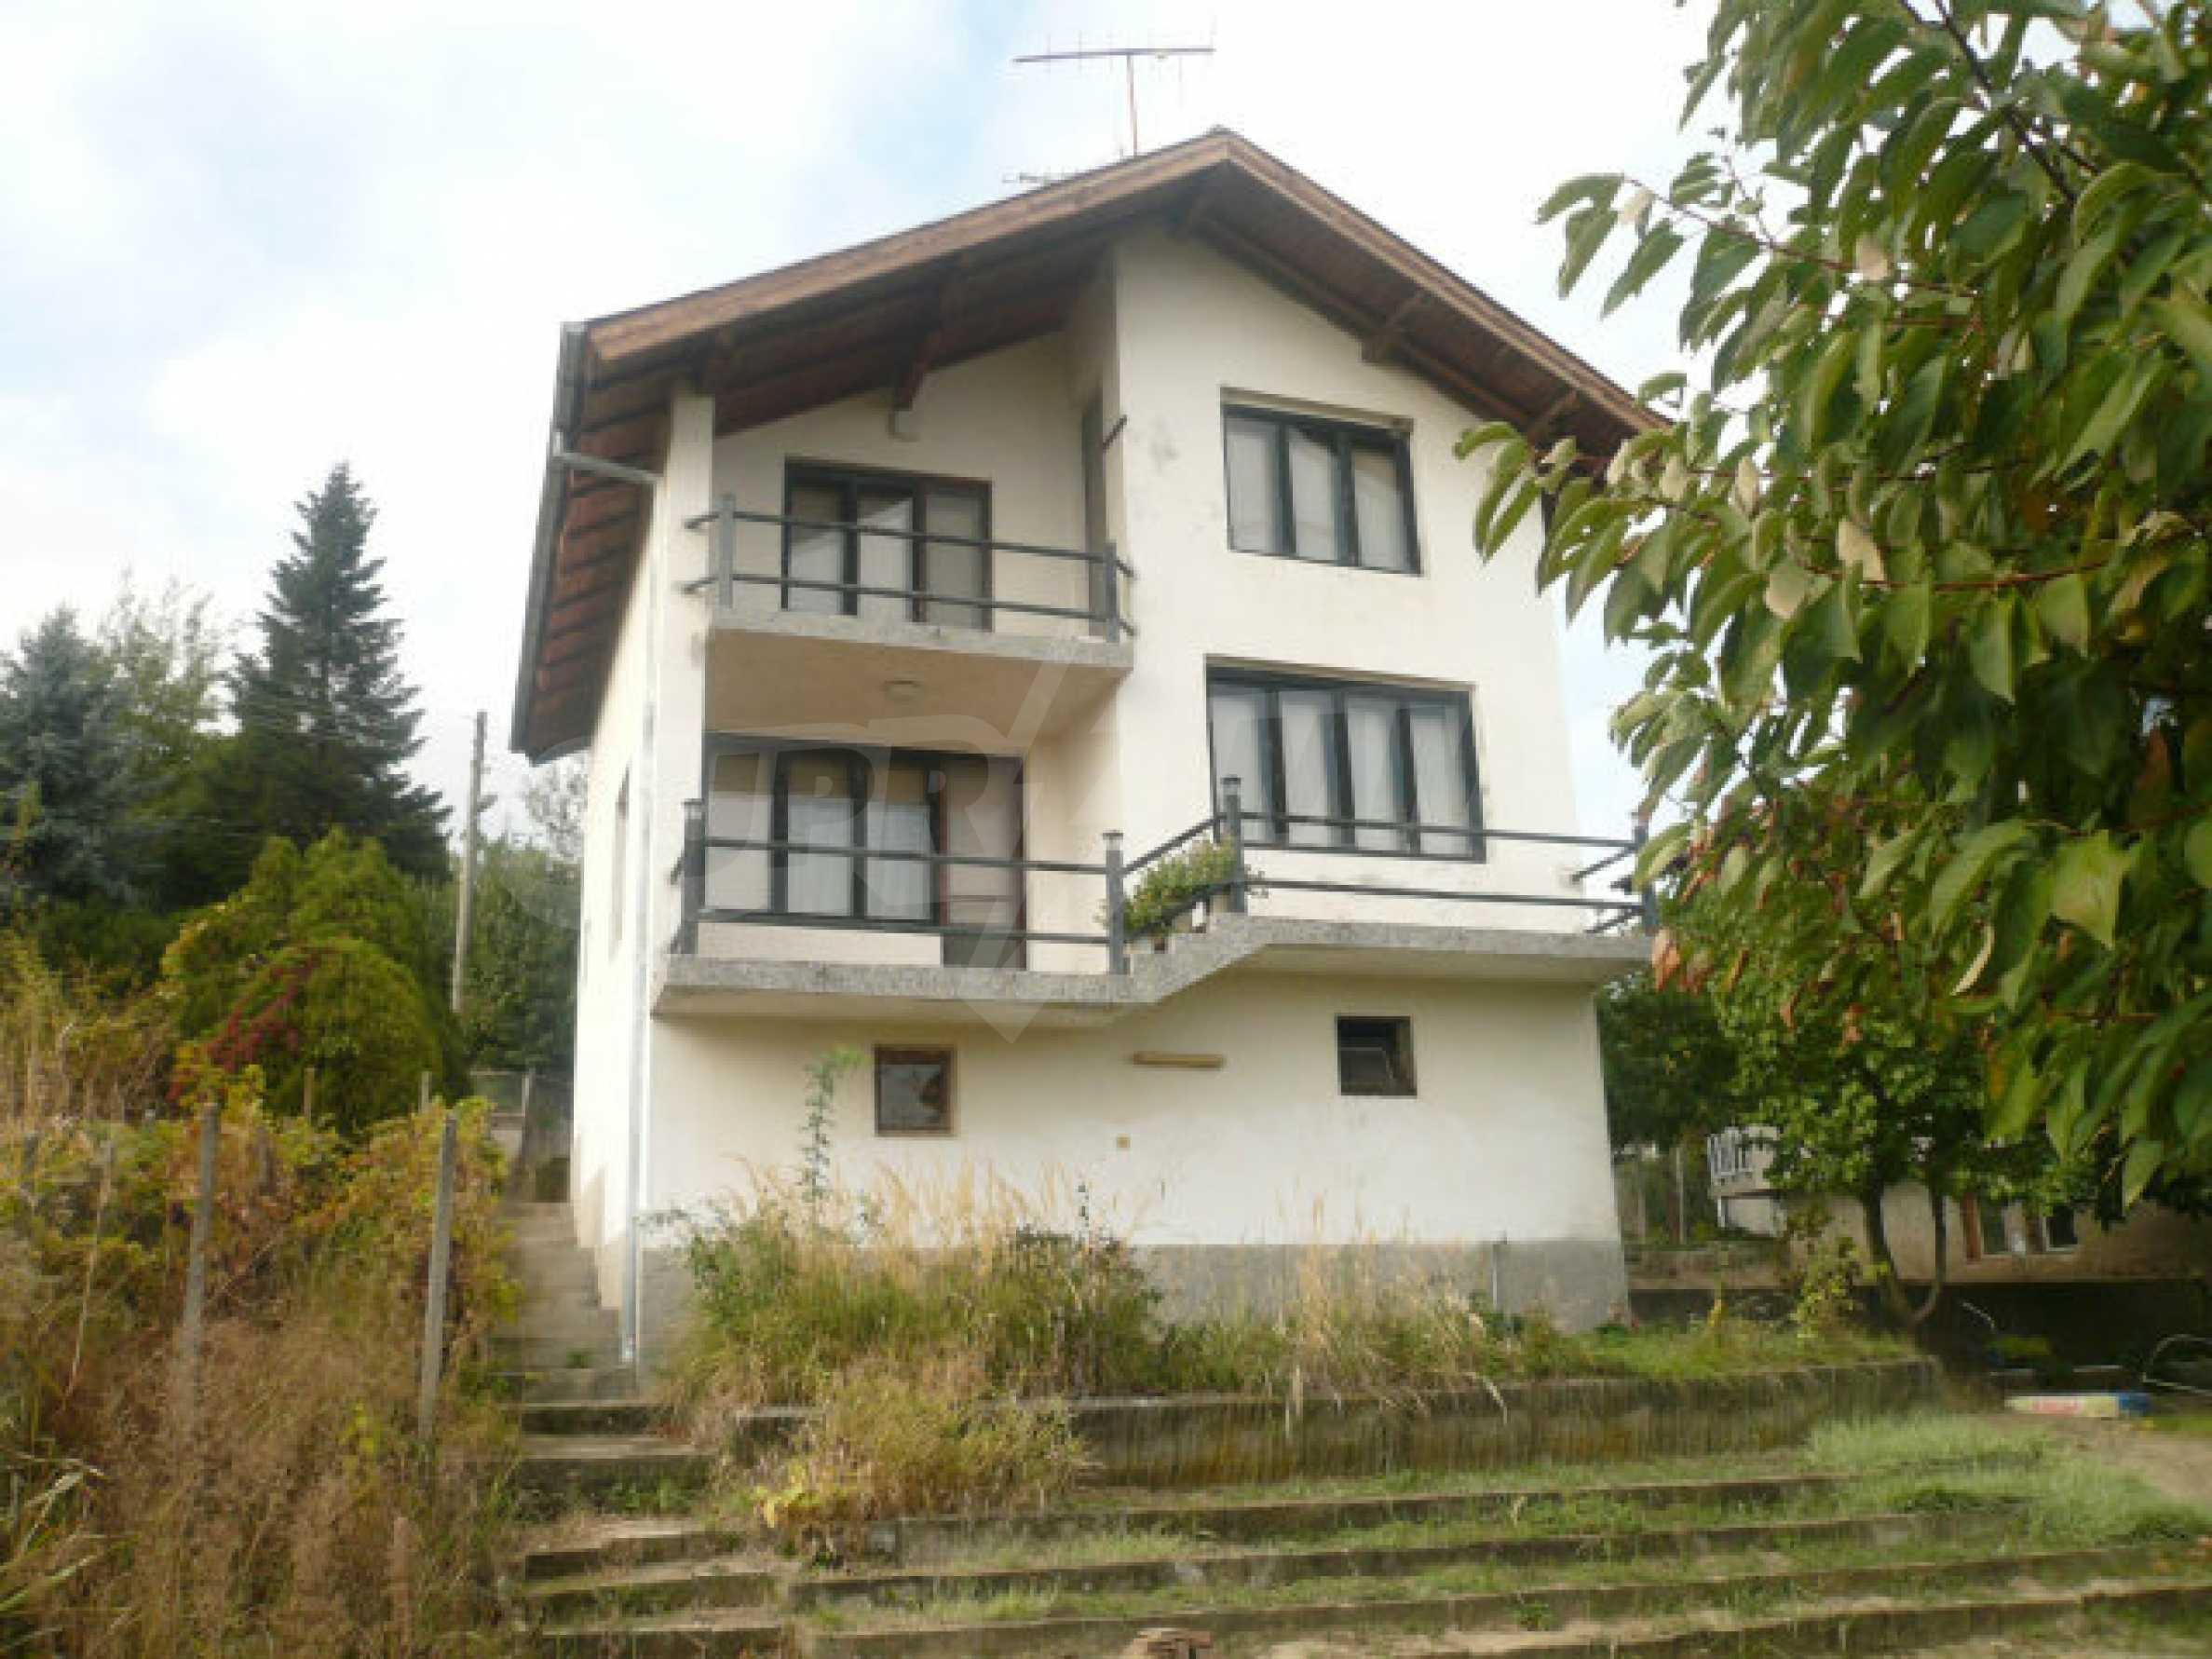 Three-storey villa next to Danube river 1